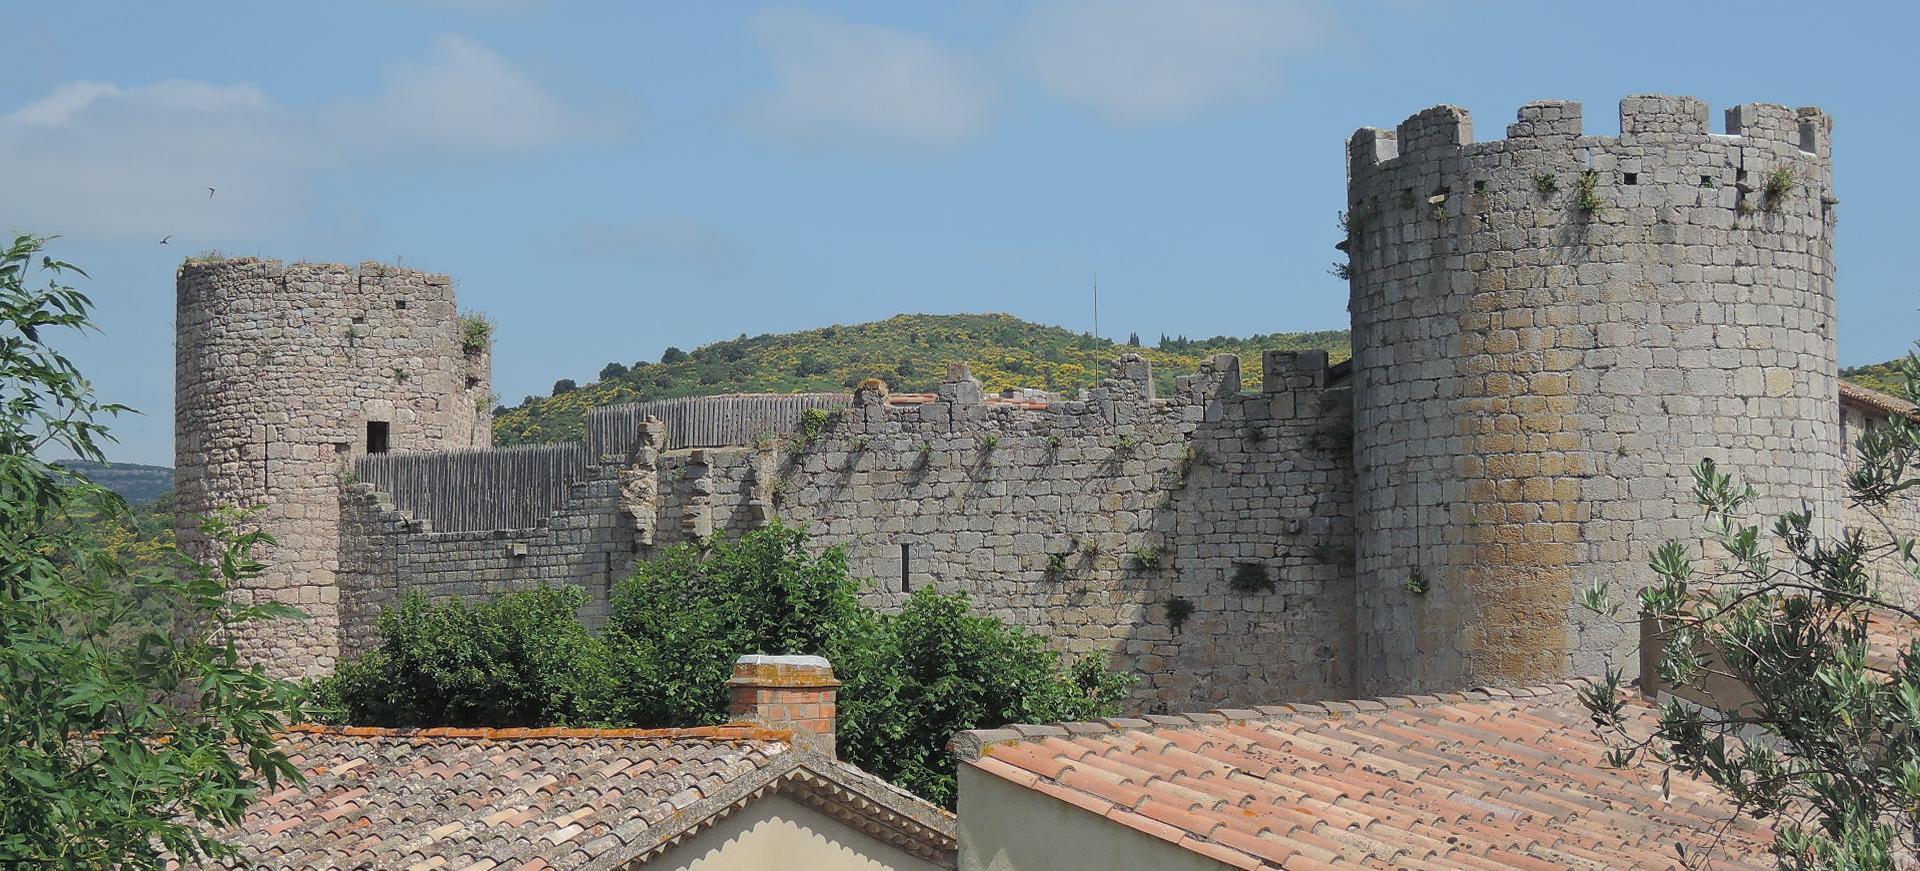 Castillo de Villerouge-Termenès.